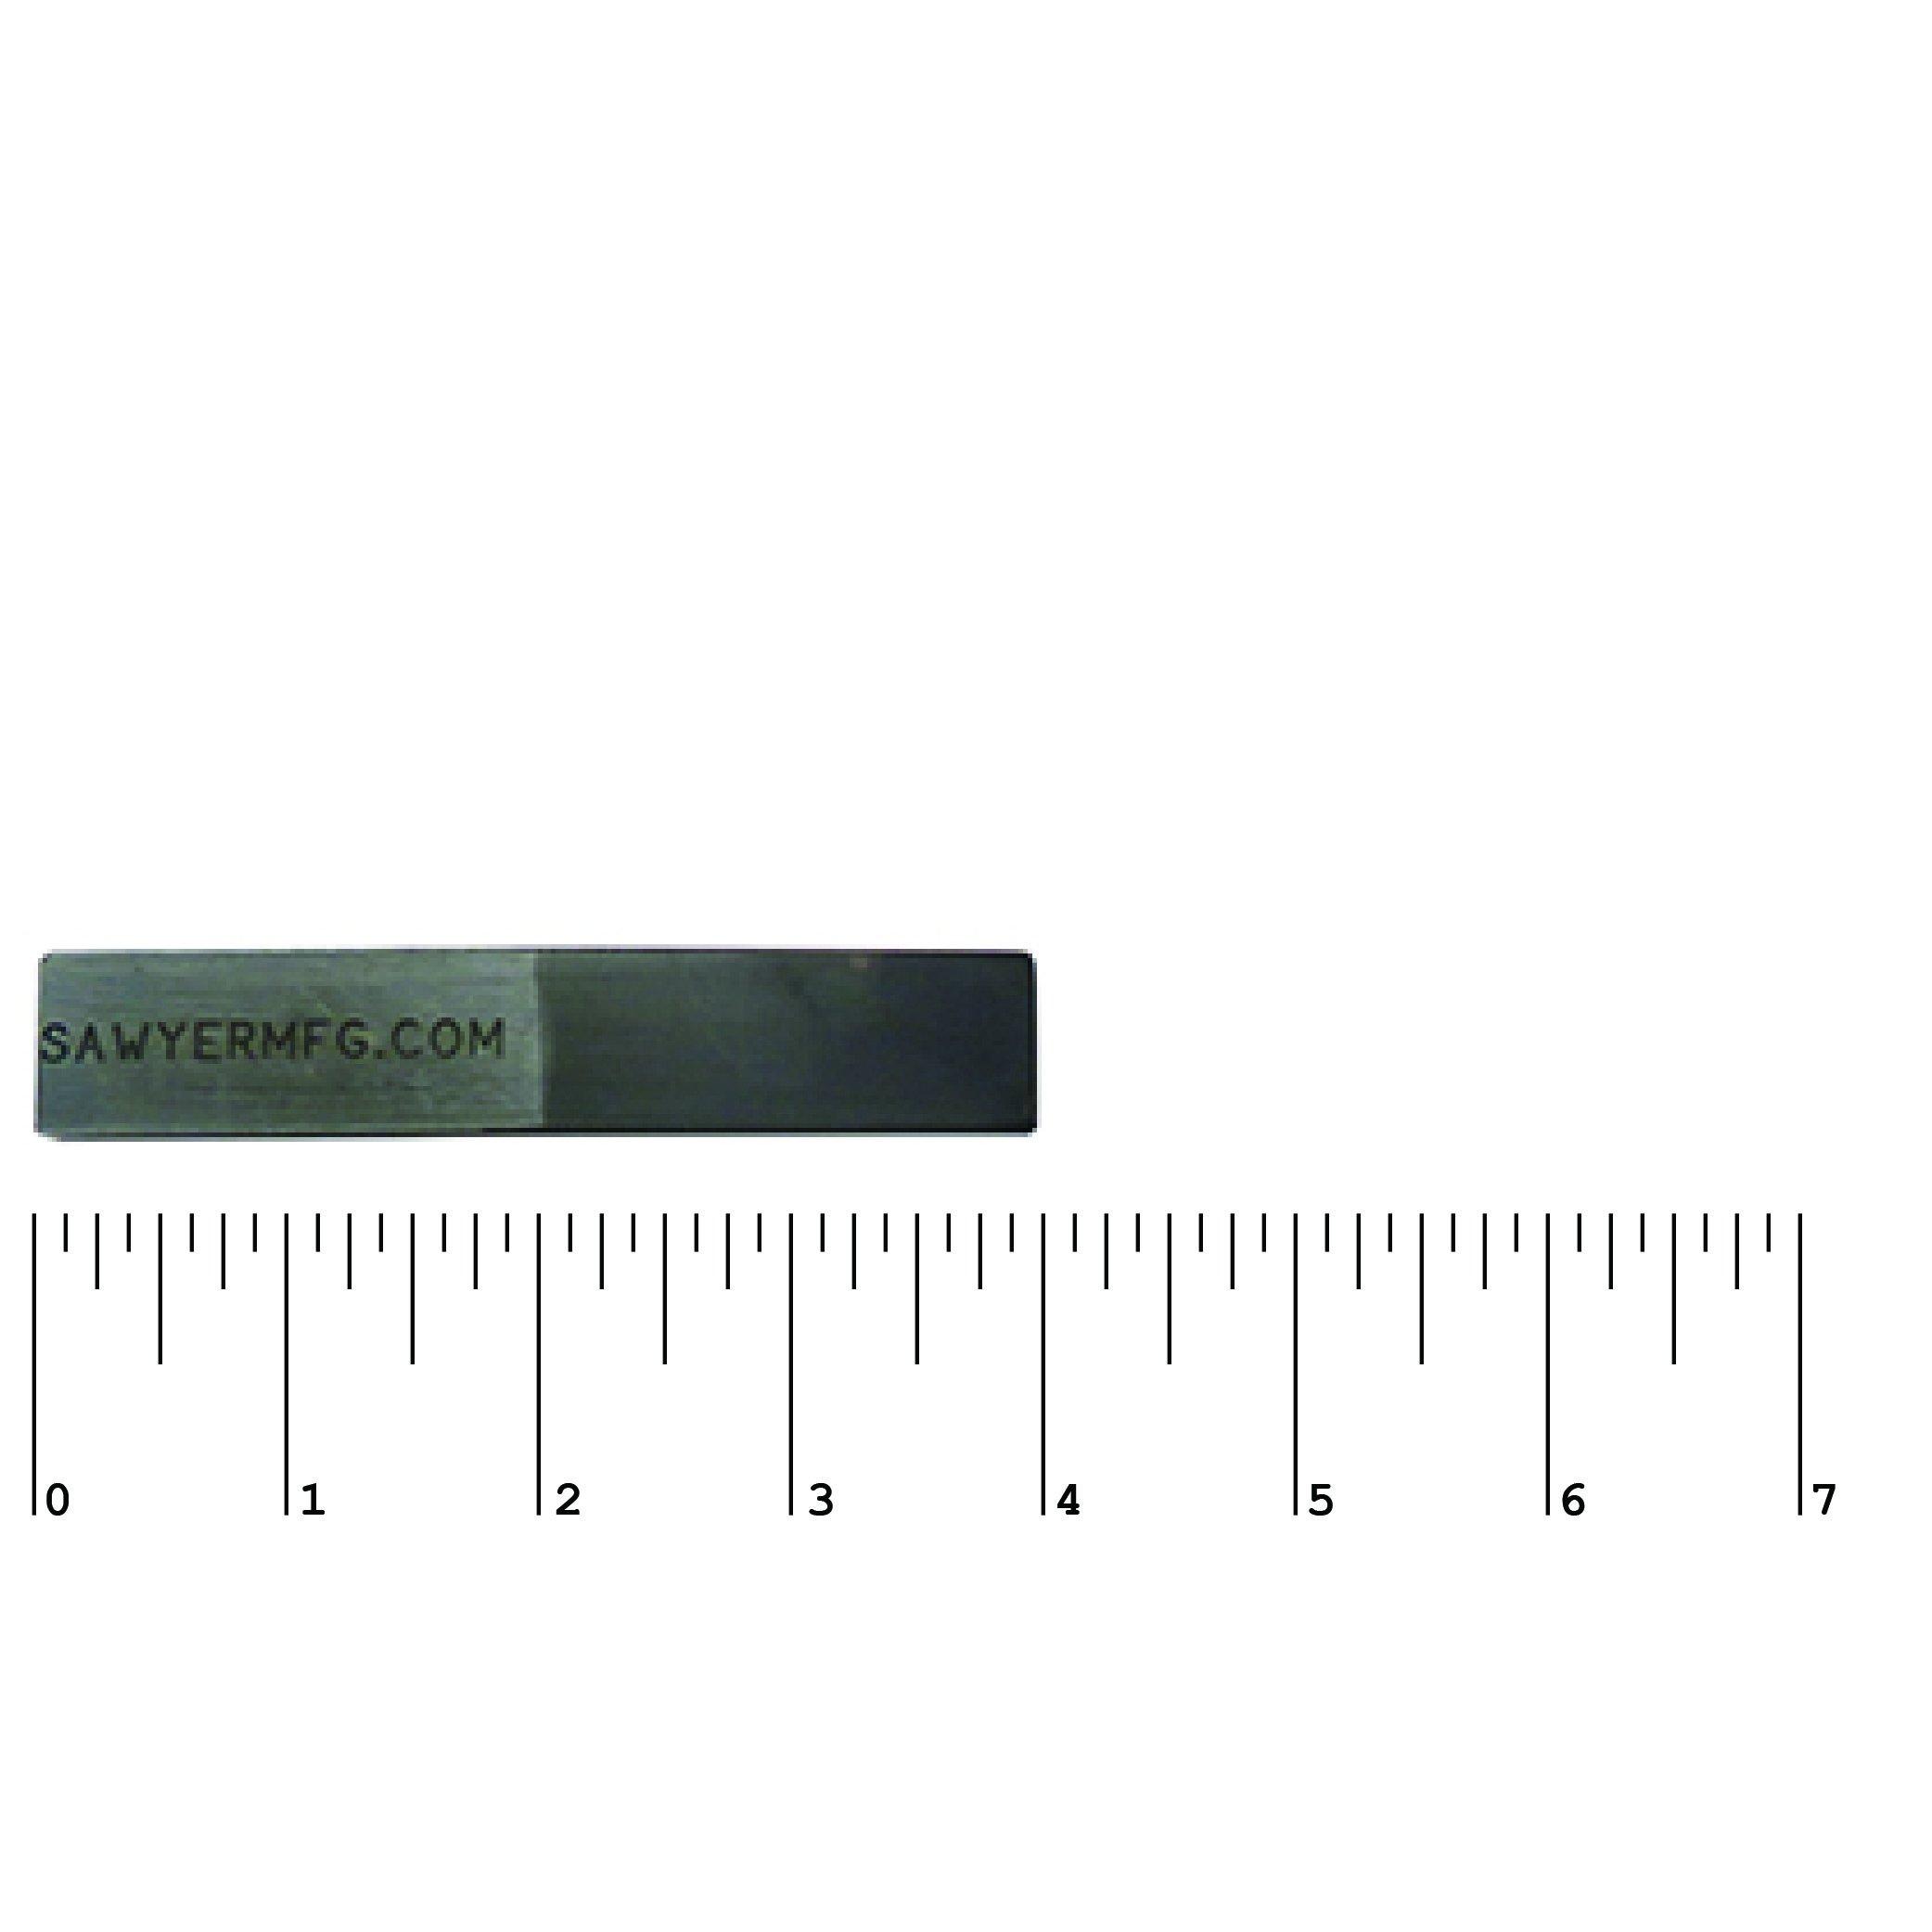 Sawyer 4'' Spacing Wedge / Spacing Tool (Small)